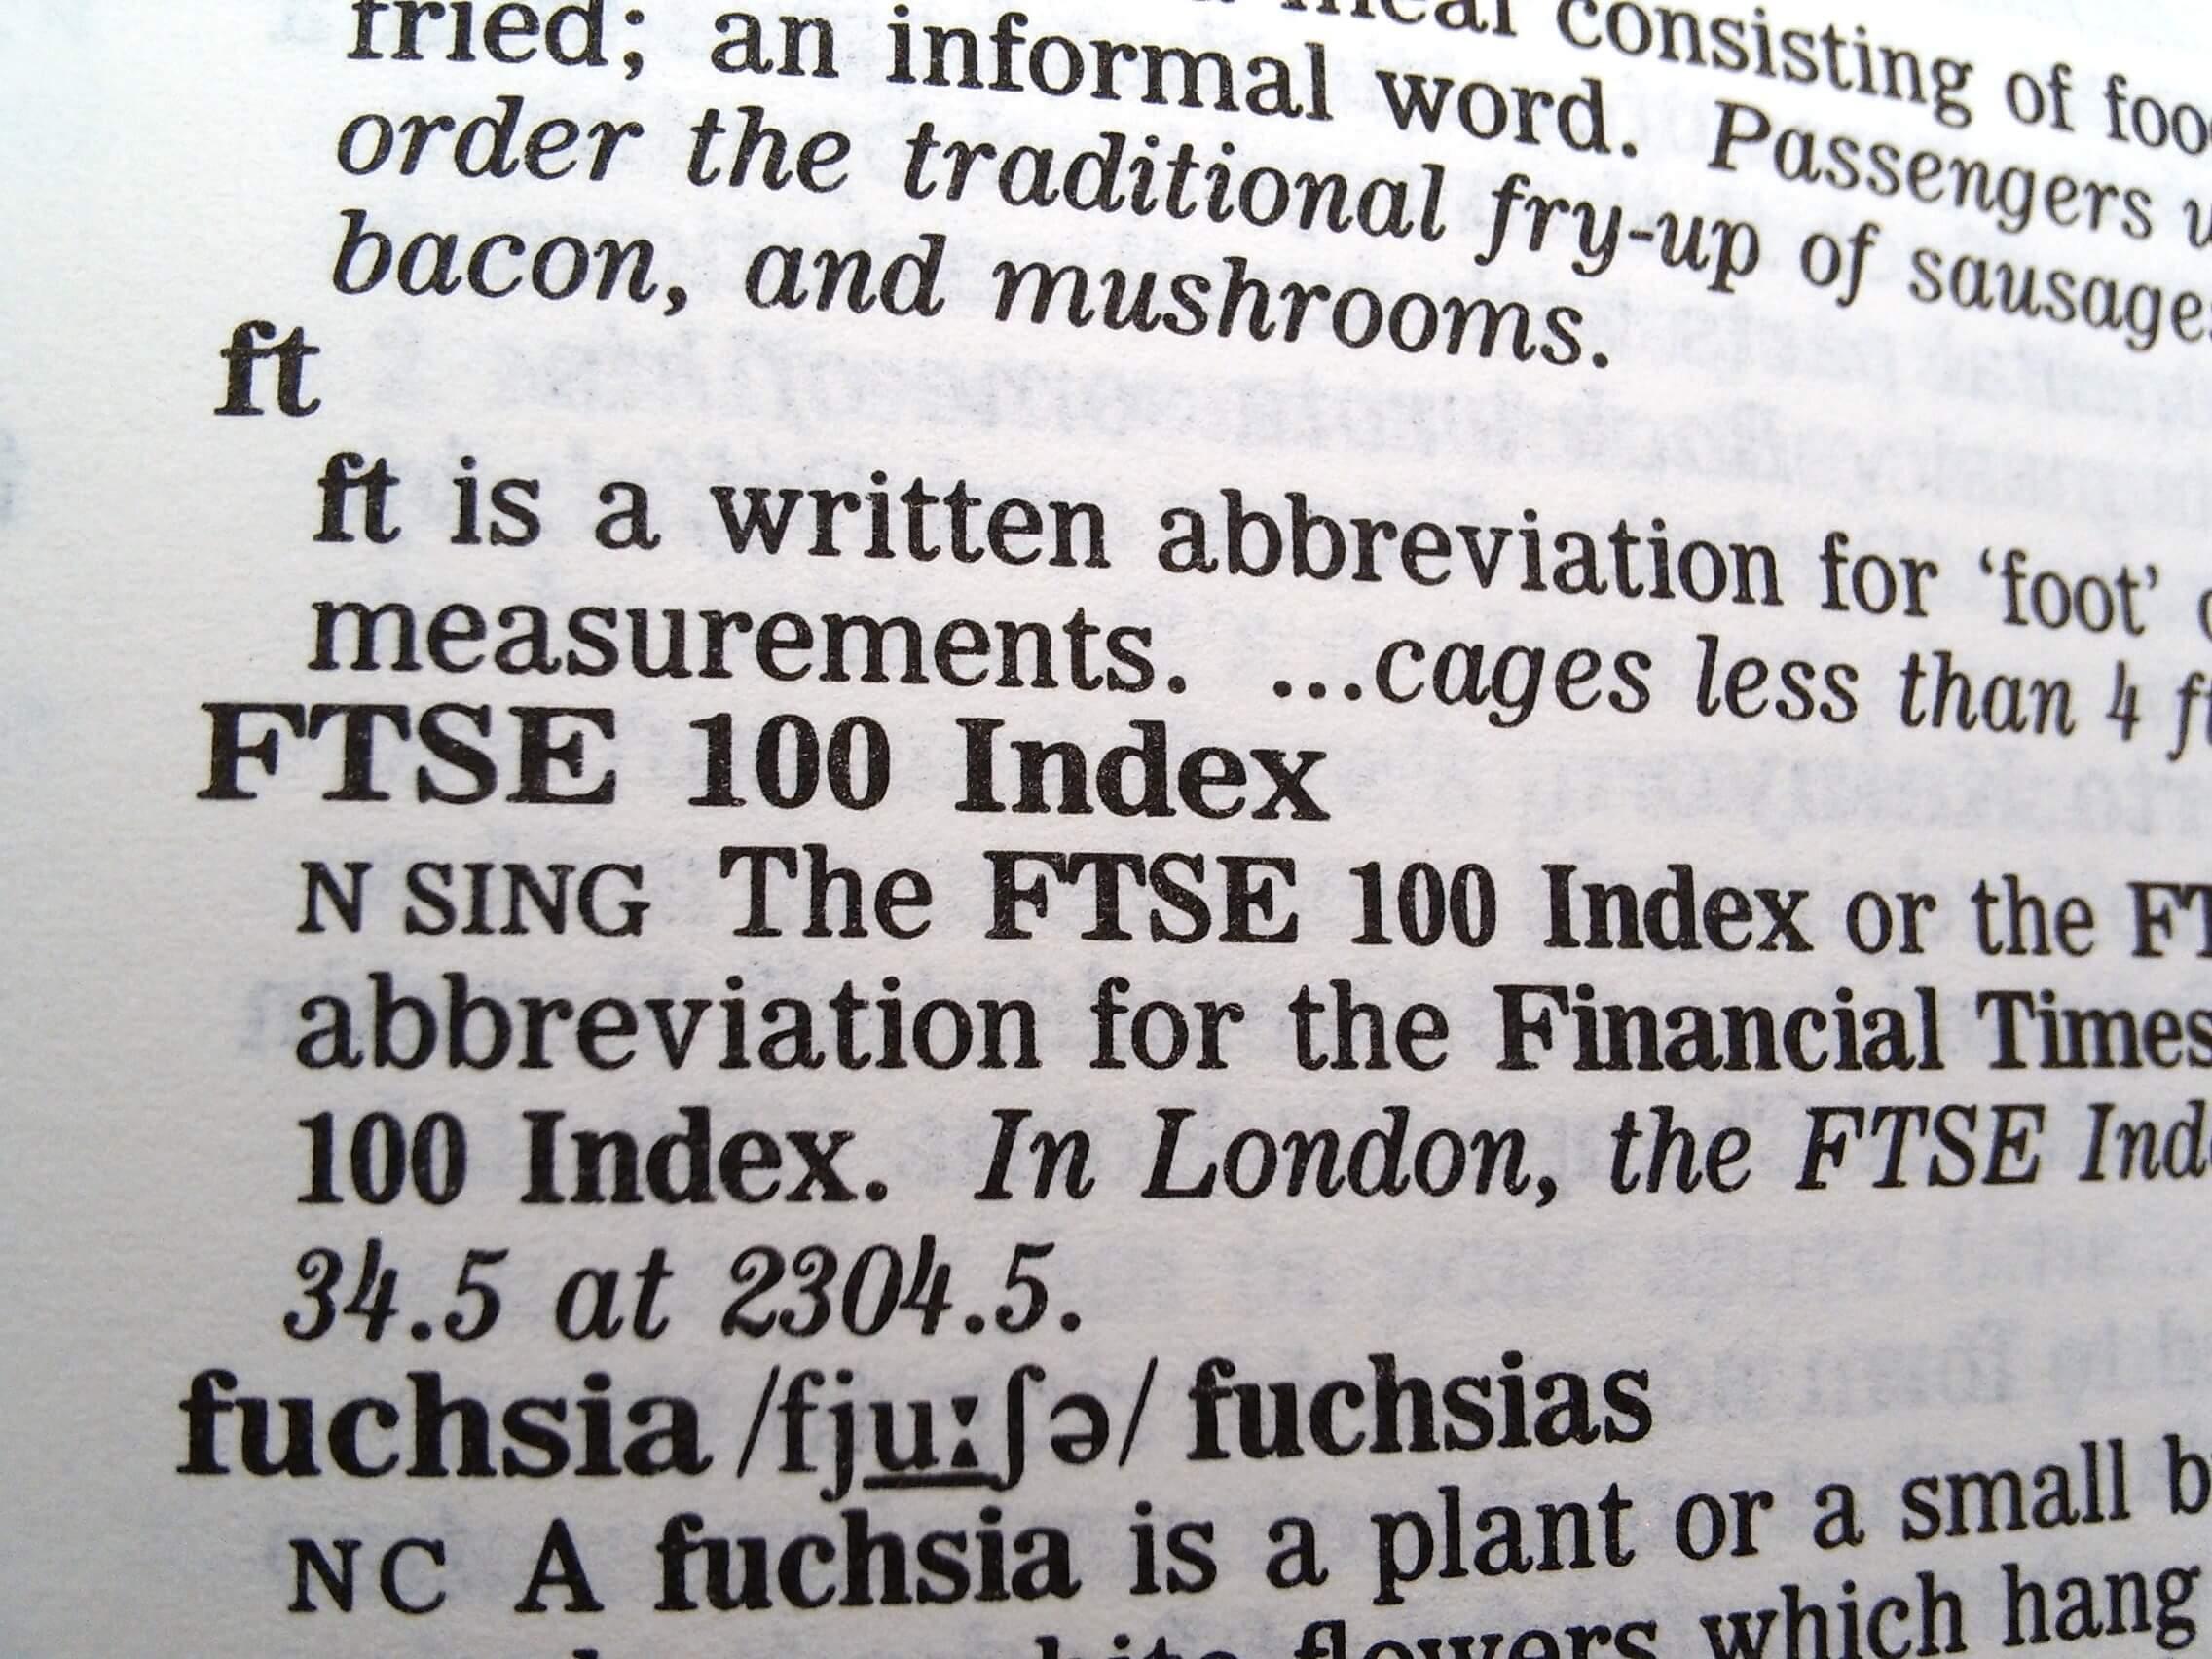 FTSE 100 Index definition